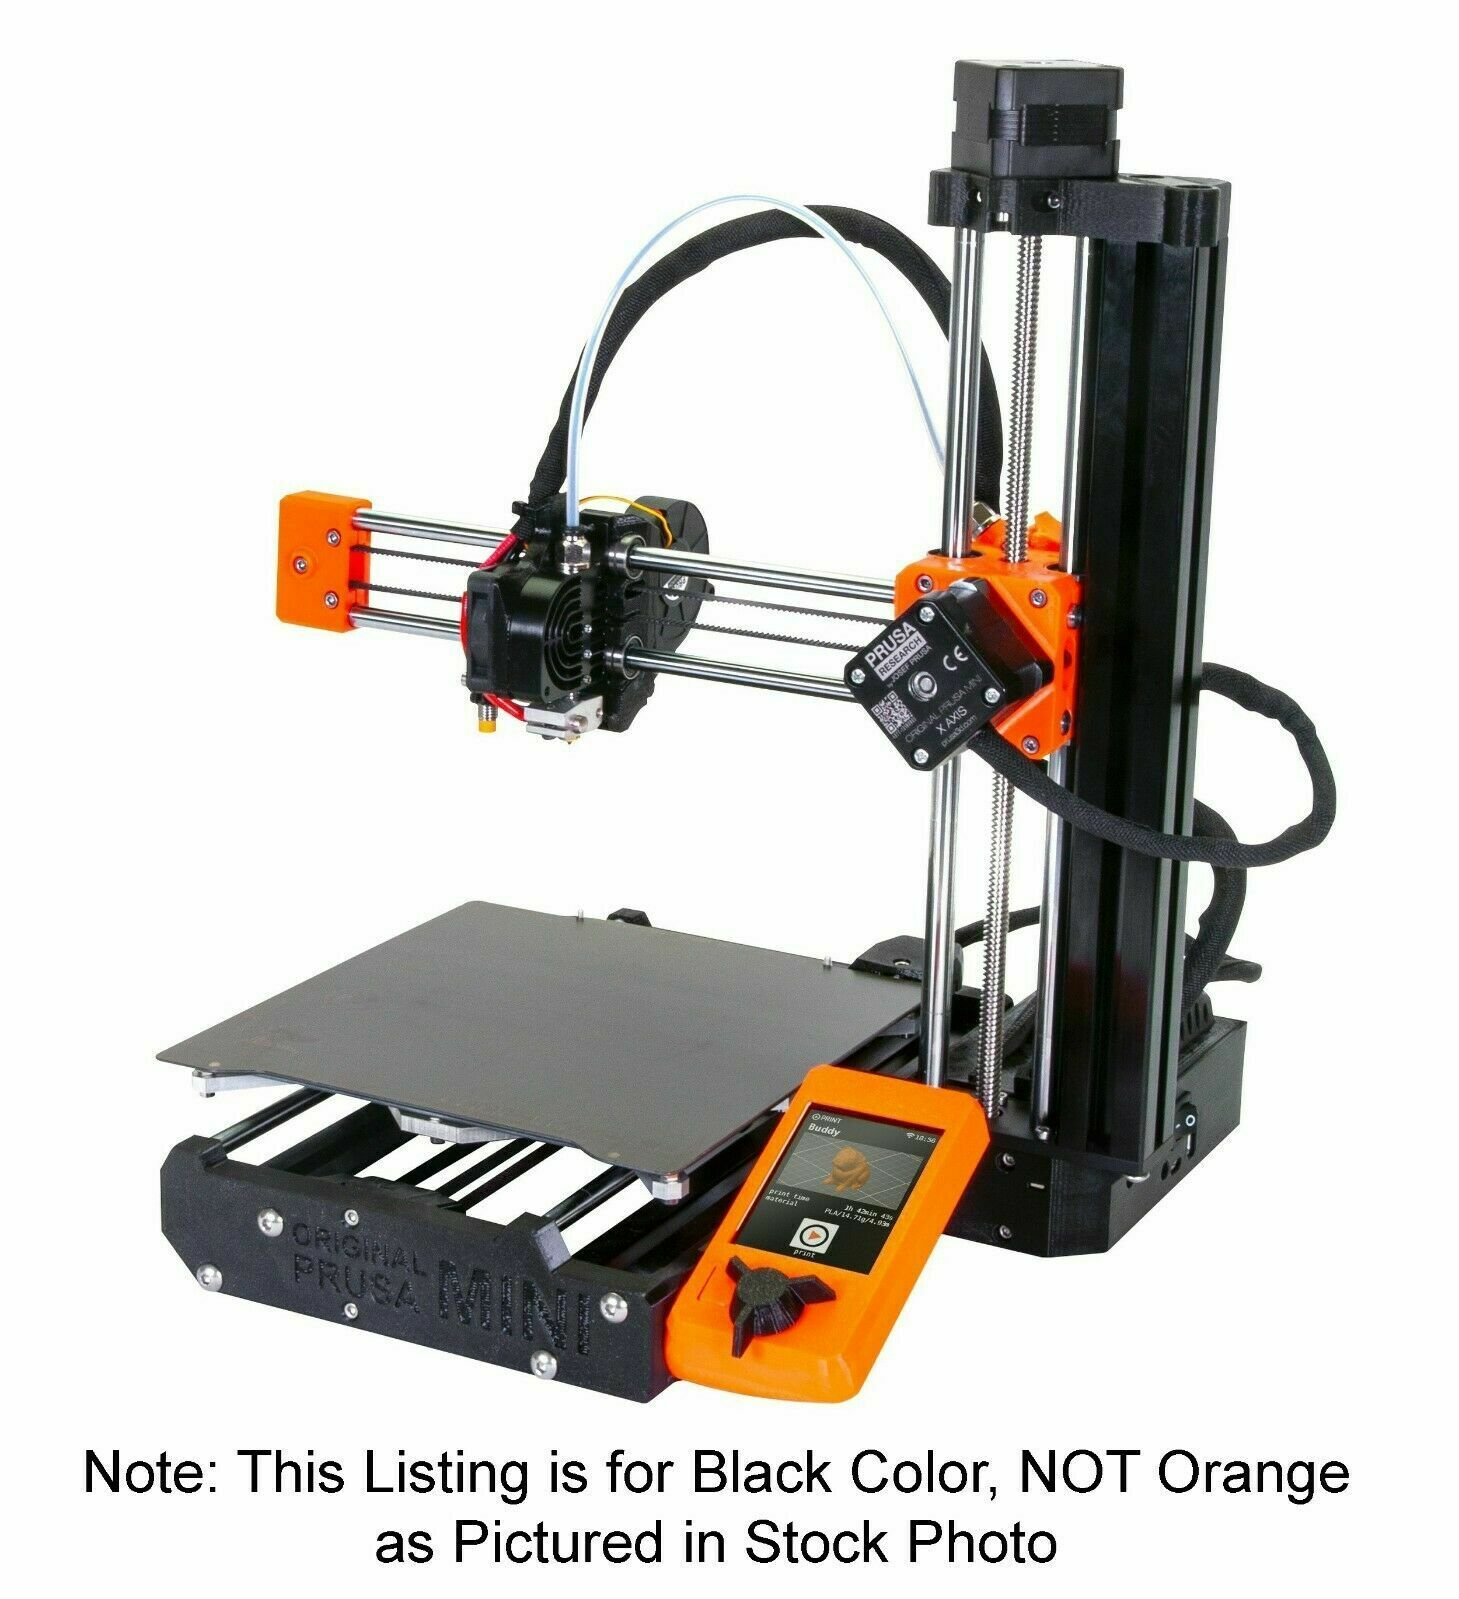 Prusa MINI+ KIT w/ Filament Sensor & PEI Sheet Black New in Box 3D Printer